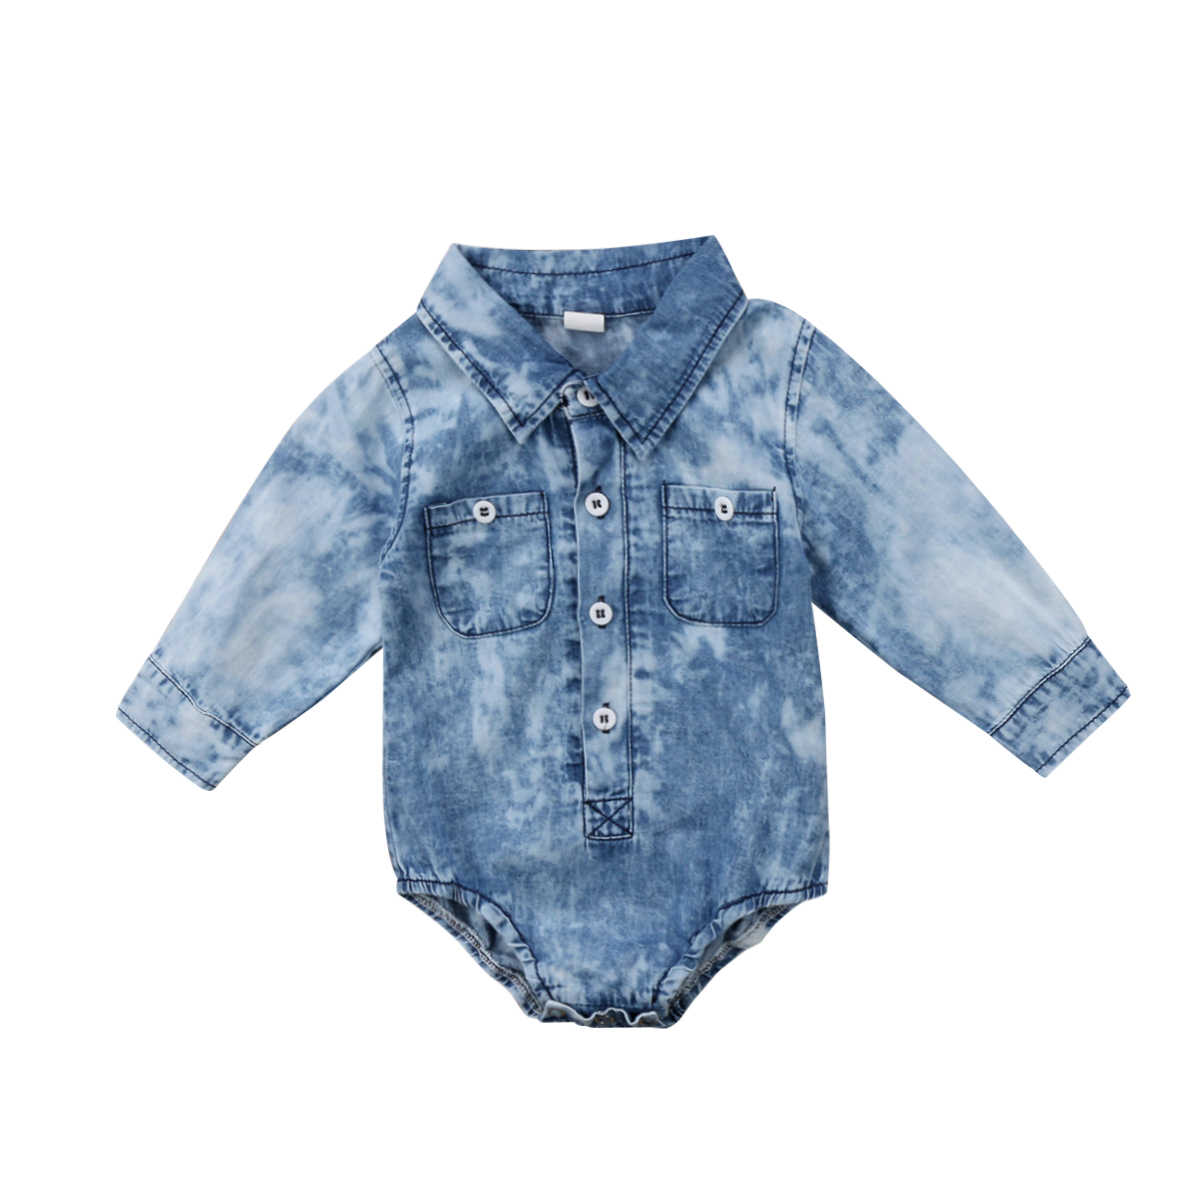 a558f3125 Detail Feedback Questions about new fashion Infant Newborn Baby Boy ...